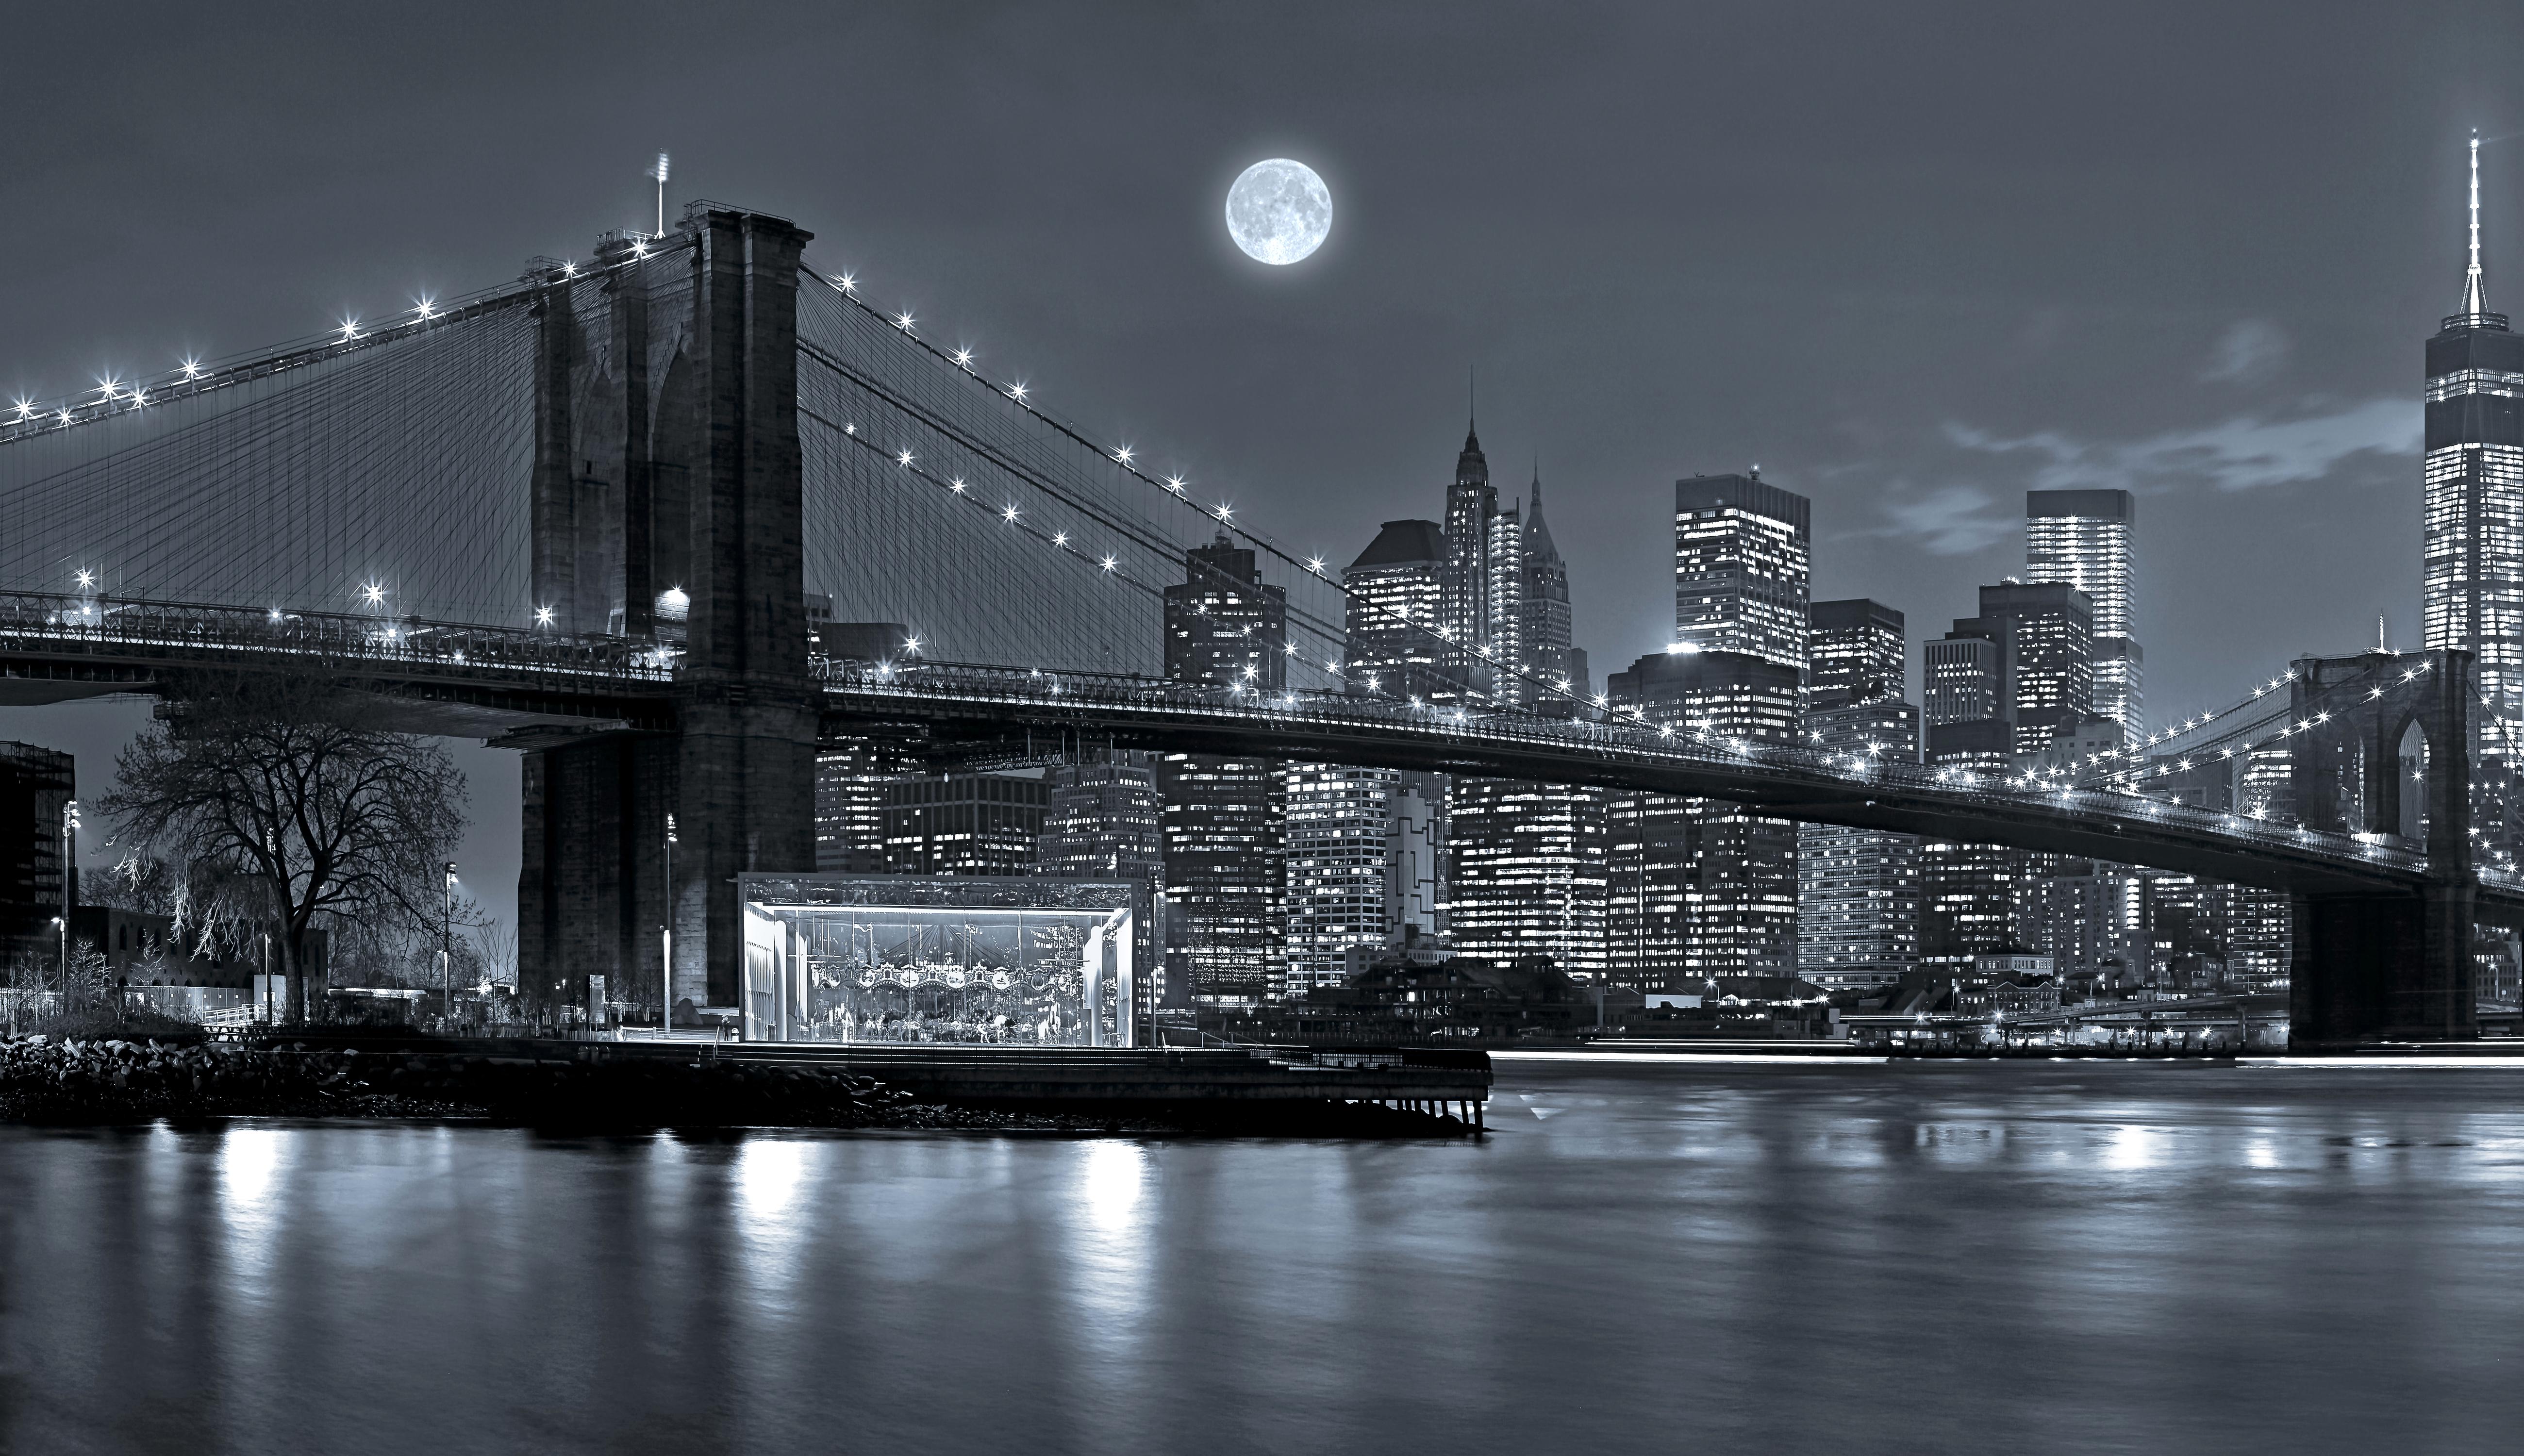 109 Brooklyn Bridge Hd Wallpapers Background Images Wallpaper